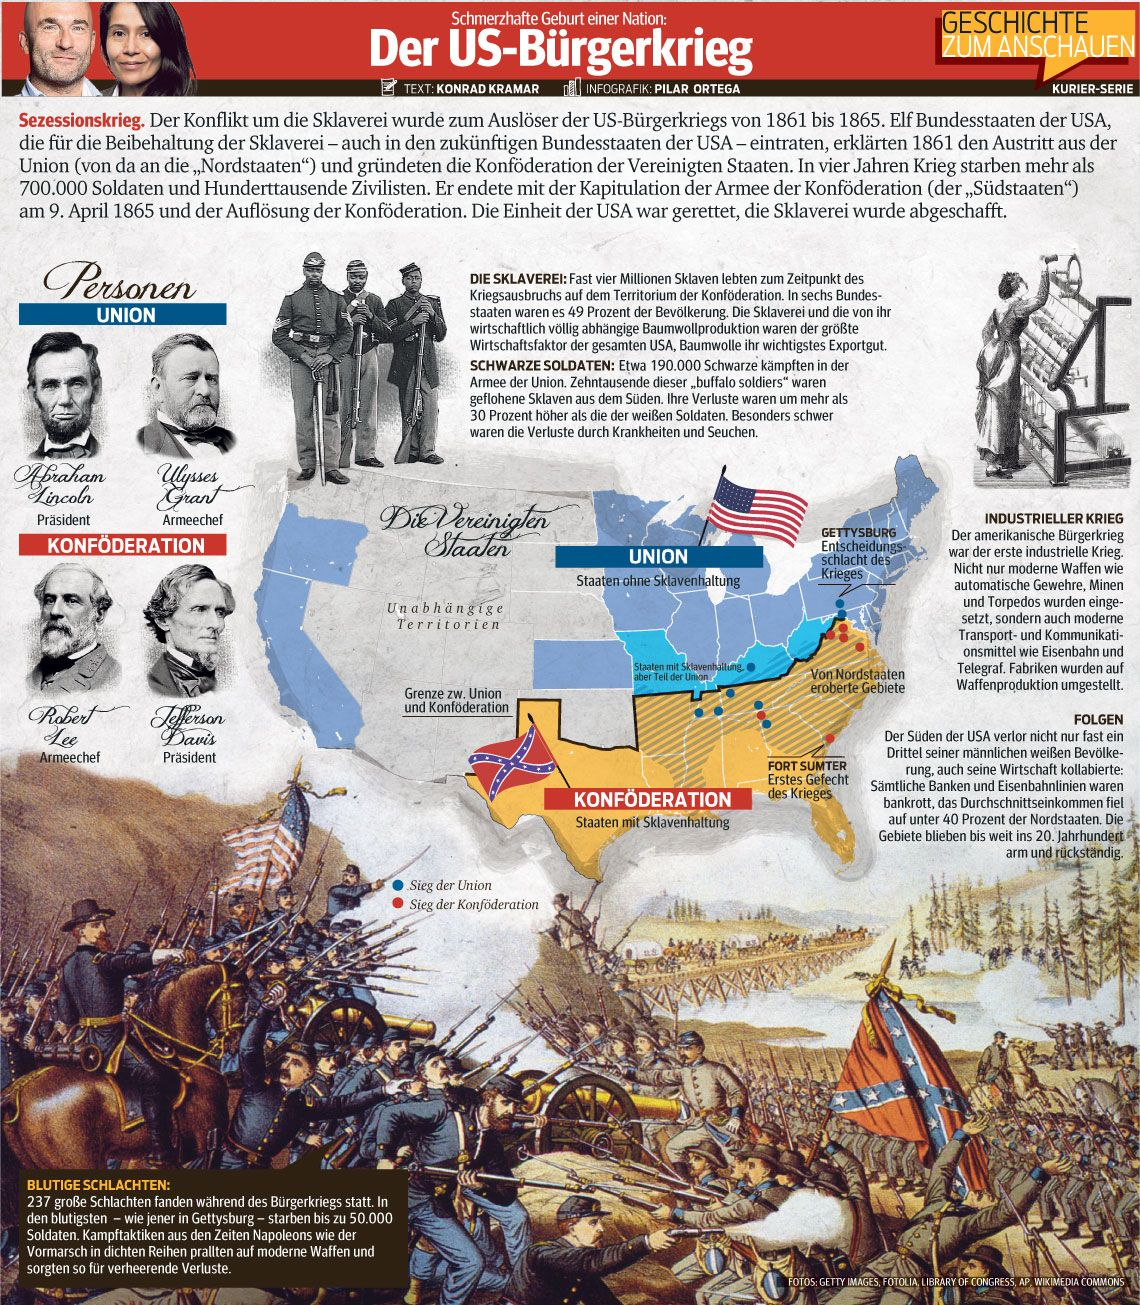 #historyfacts